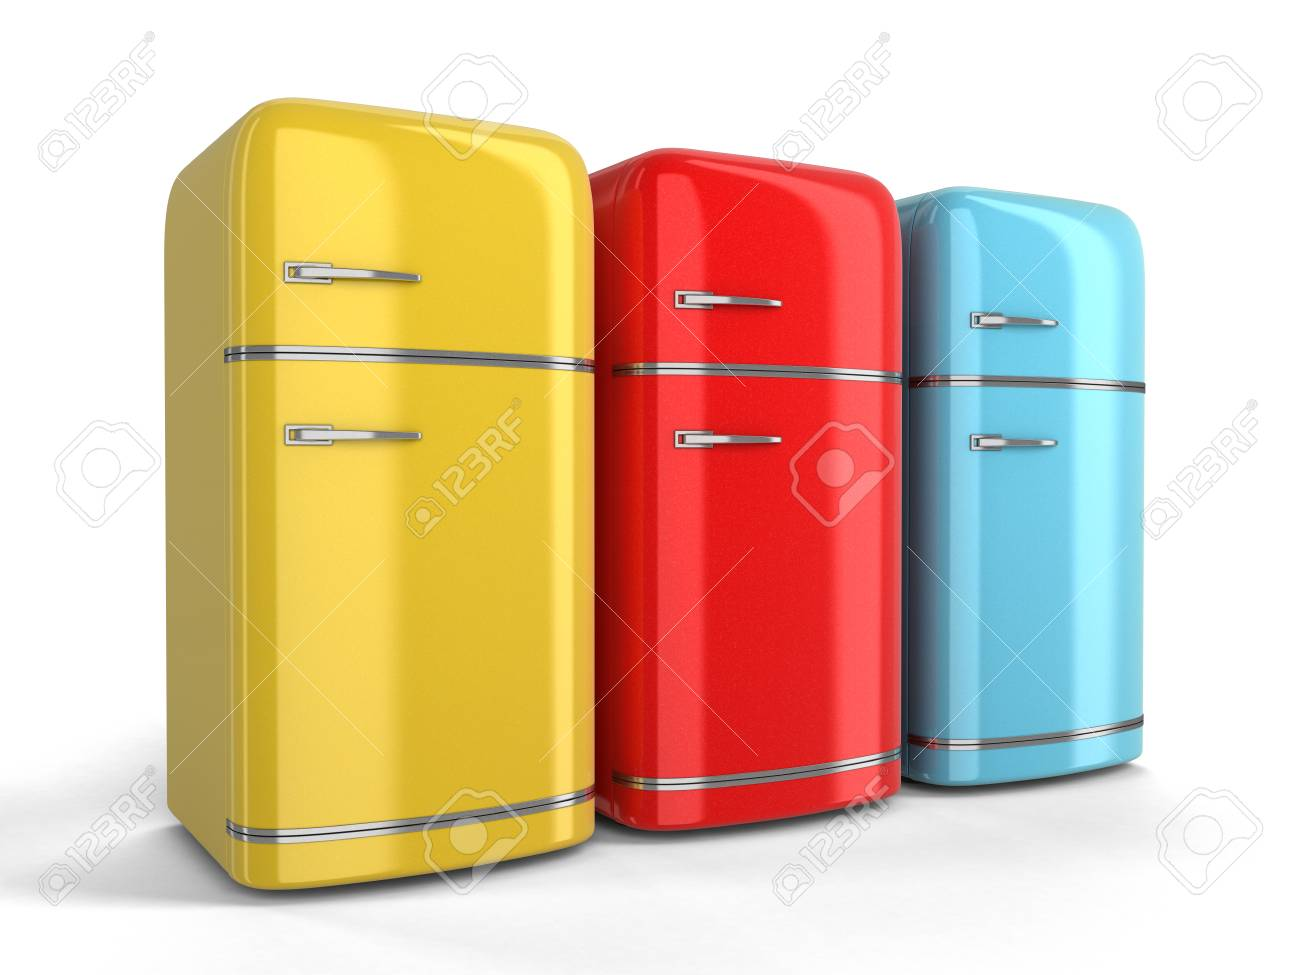 Retro Kühlschrank Grau : Retro kühlschrank günstig smeg kühlschrank retro frisch retro